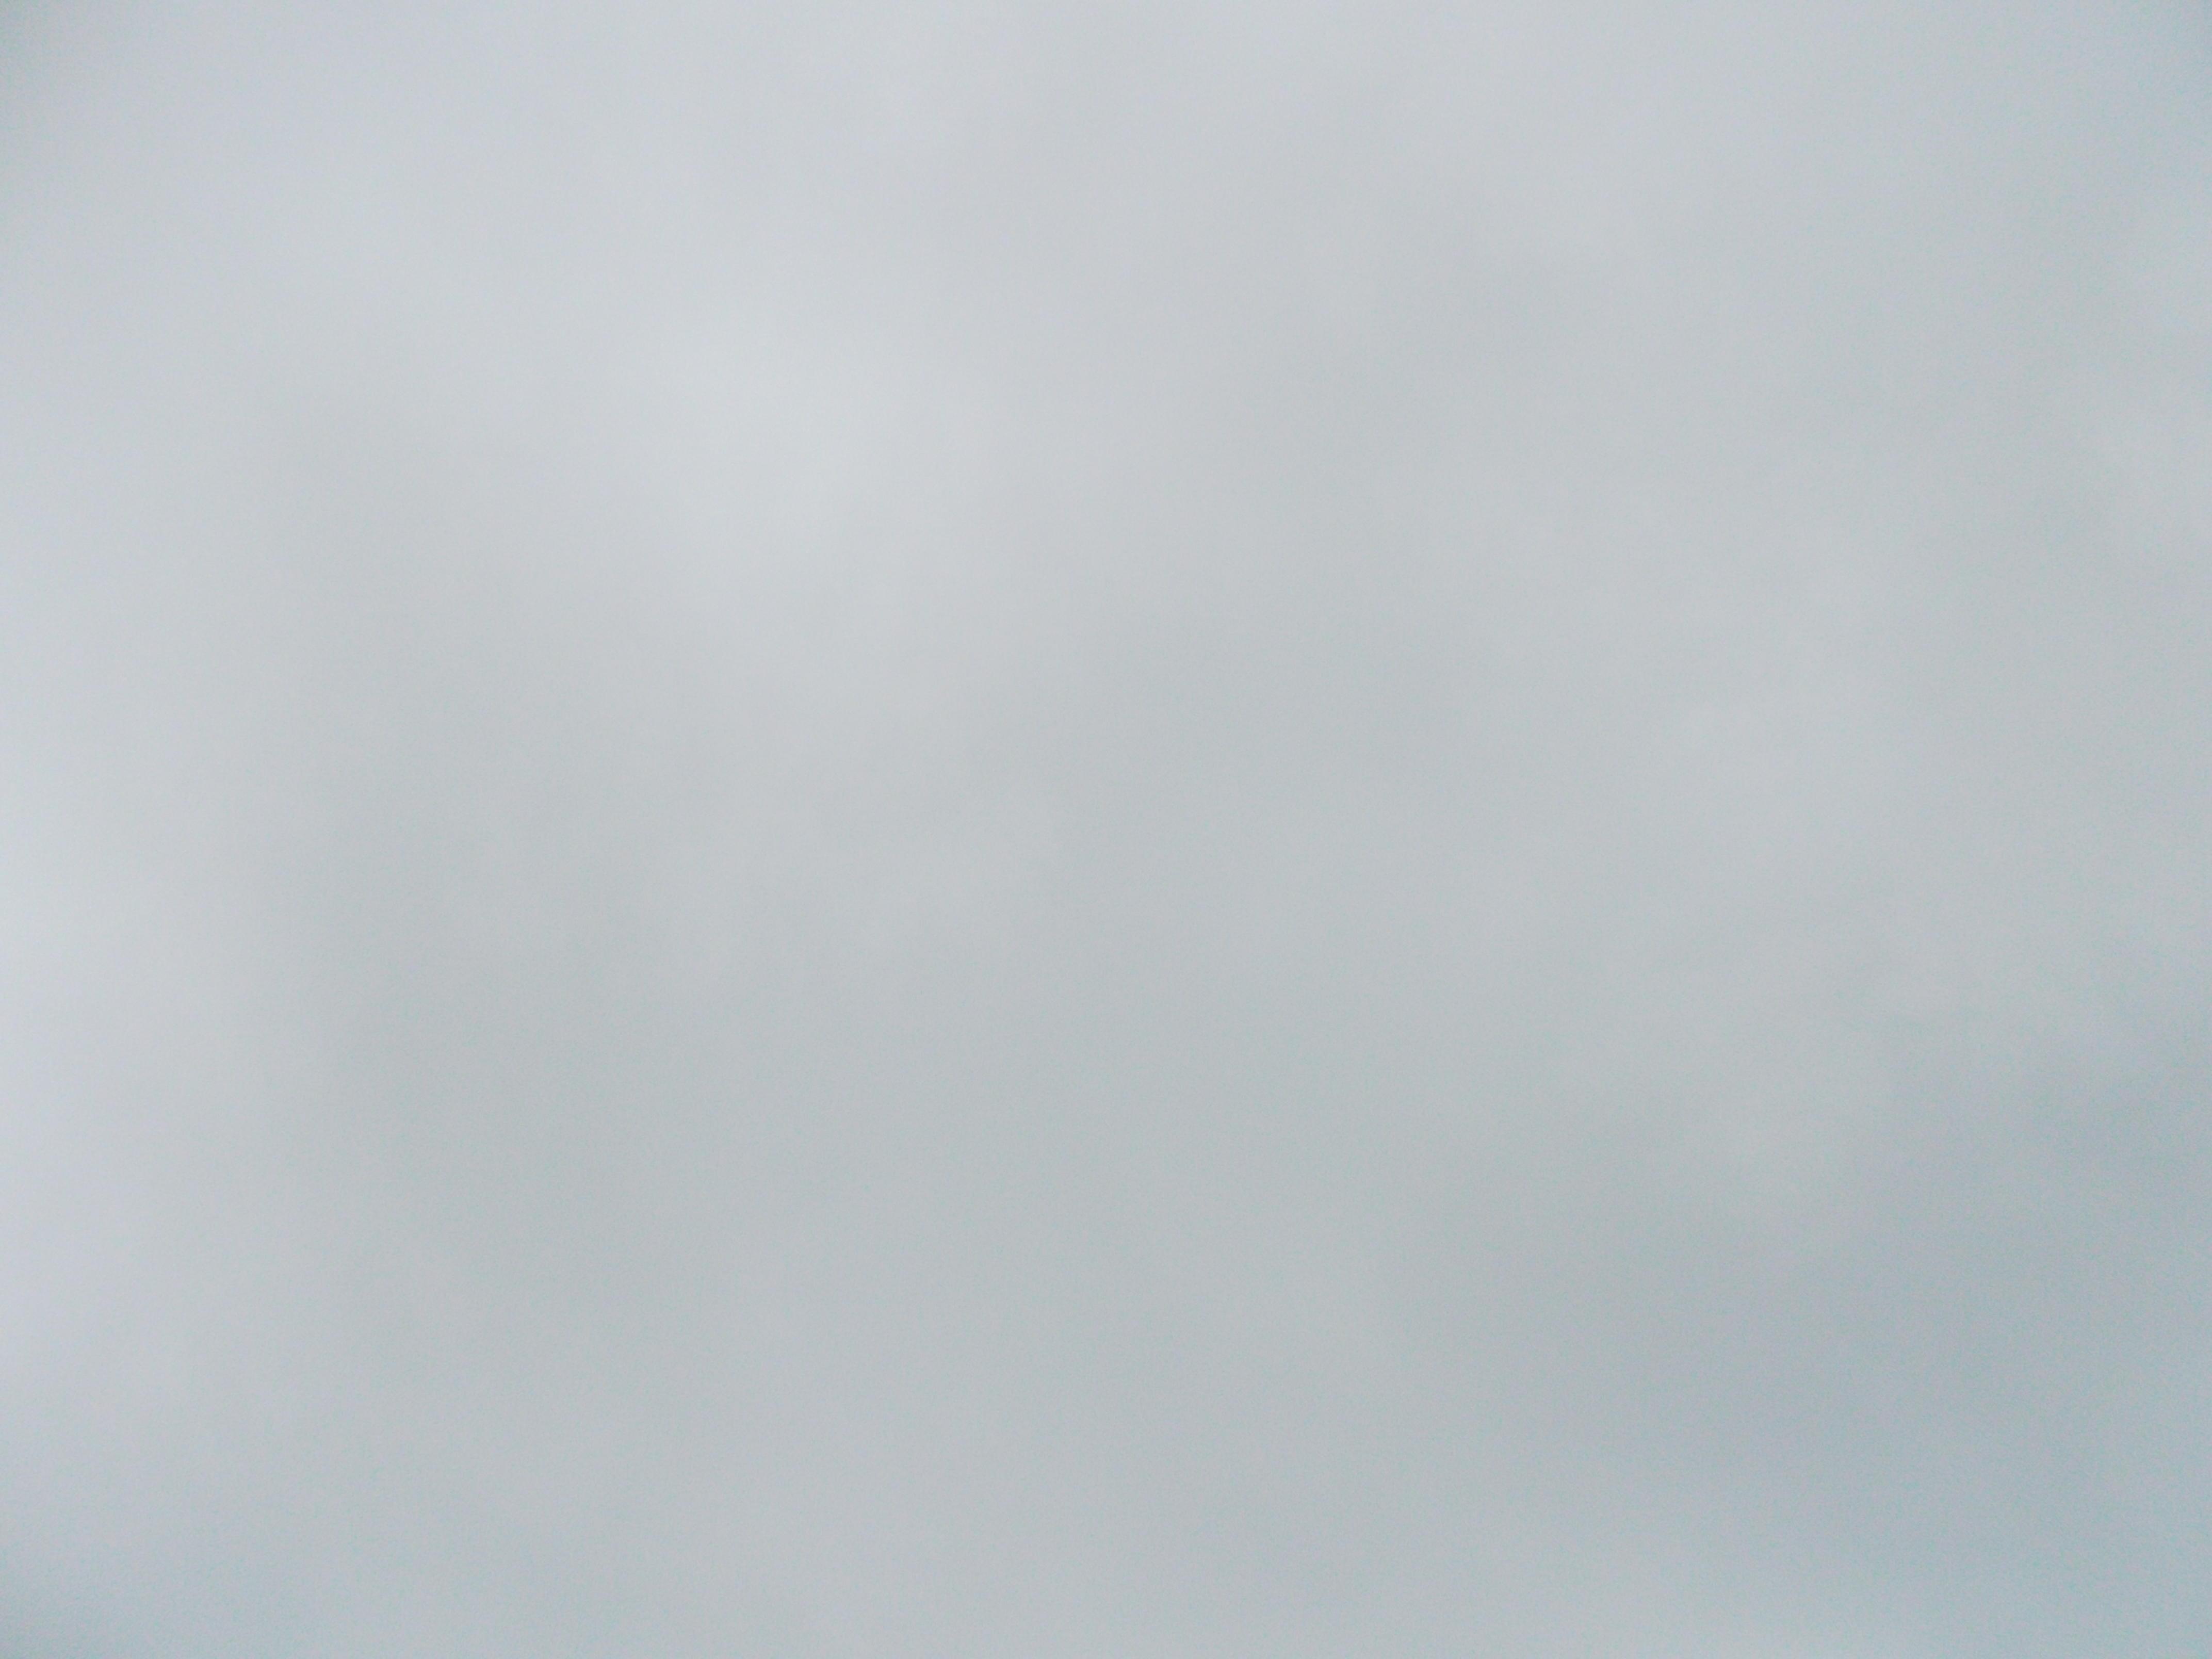 2013-03-07 Longitude -1.08 Latitude 48.85444 Altitude 94 Heure 12h13.